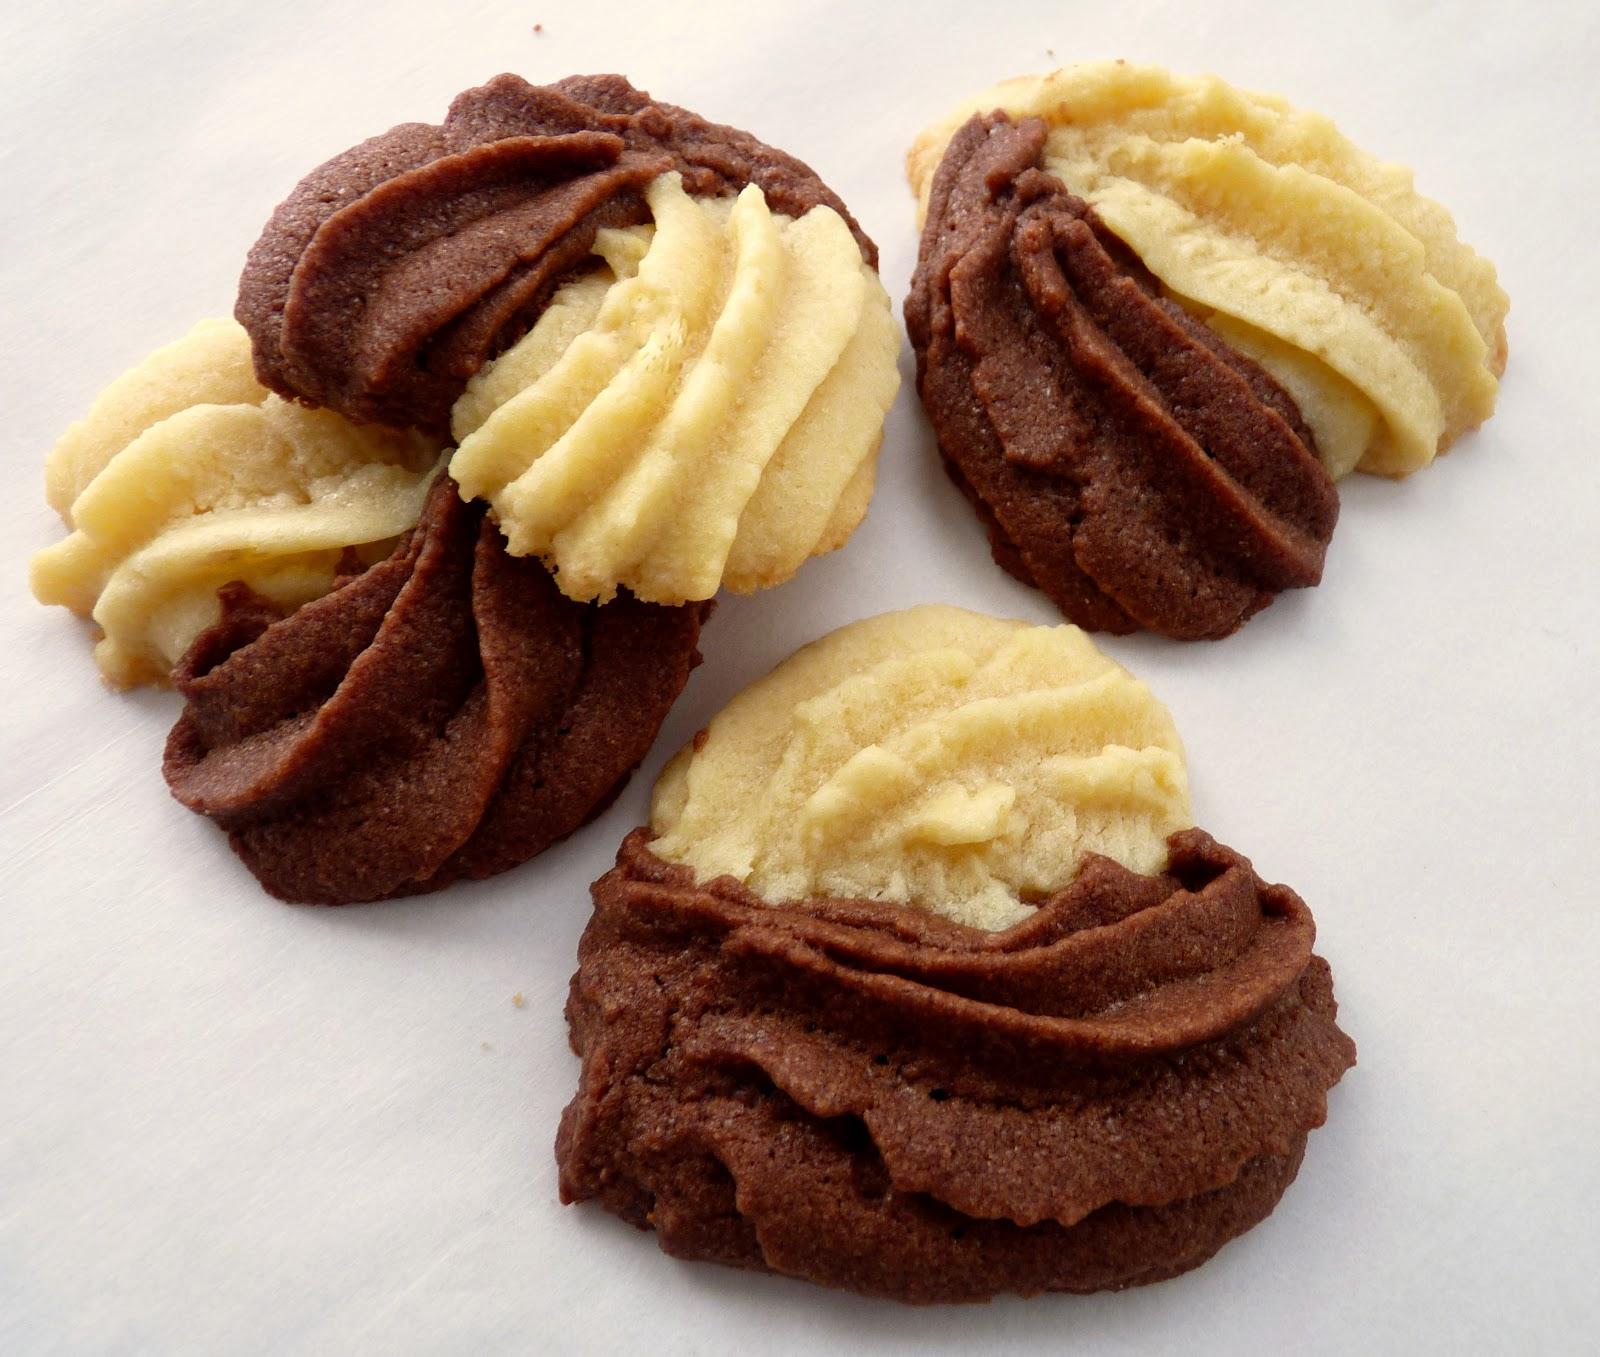 pastry studio: Vanilla & Spiced Chocolate Cookies